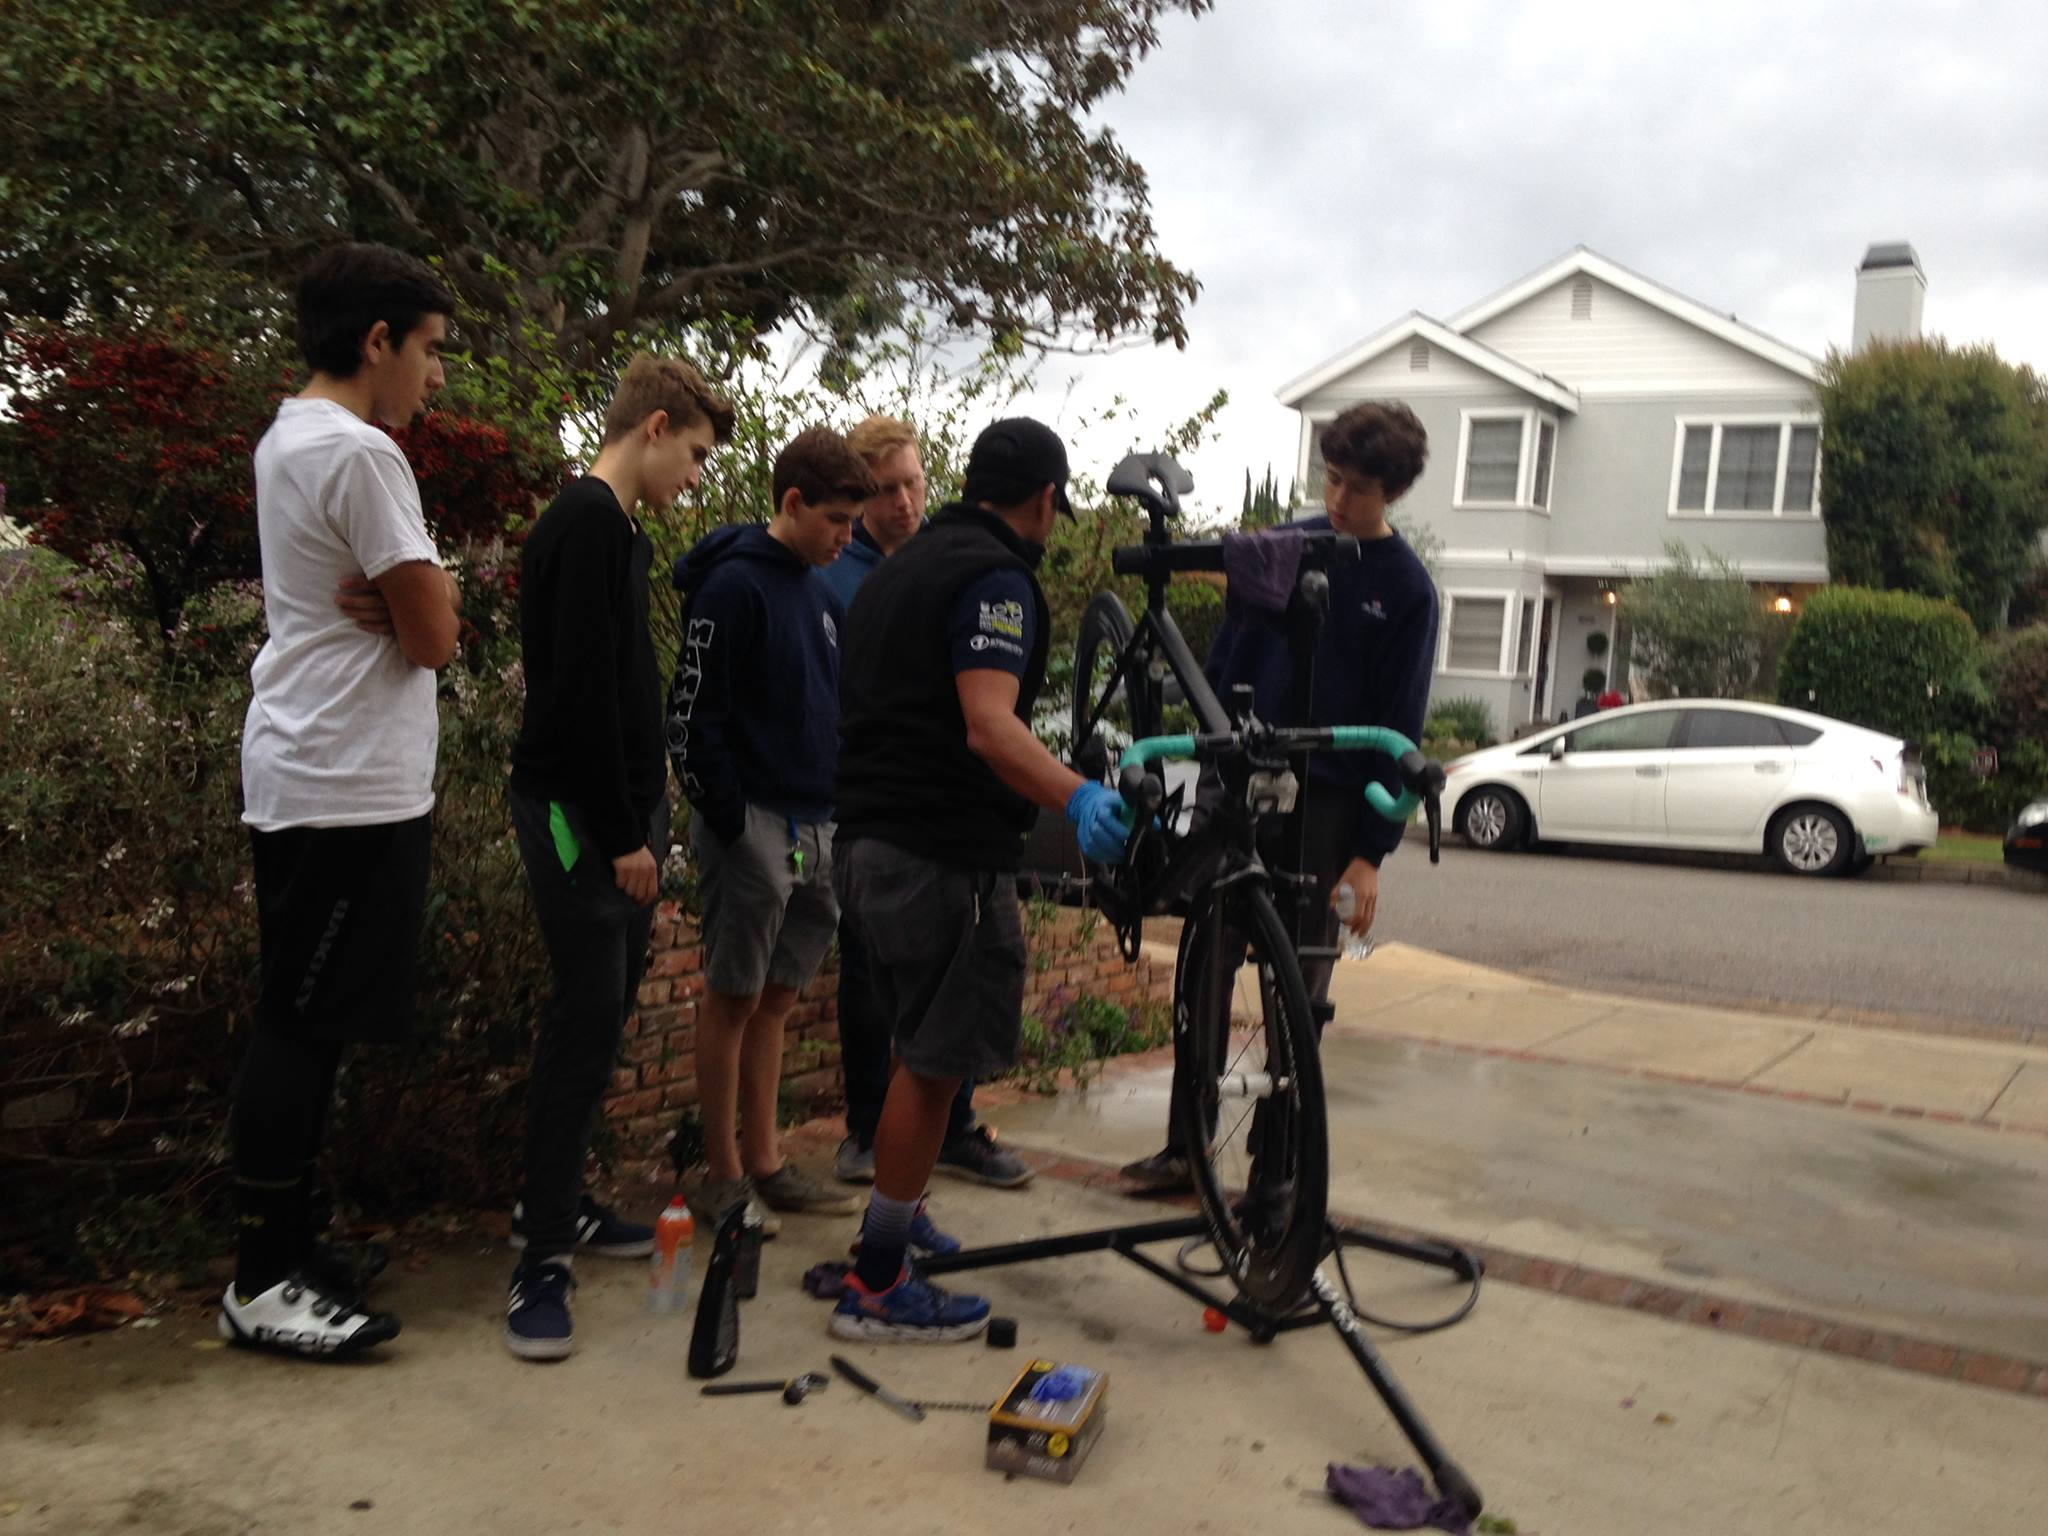 Helen's Cycles head mechanic Erick Rodas donates his time to put on a bike maintenance clinic for our La Grange Development juniors team.